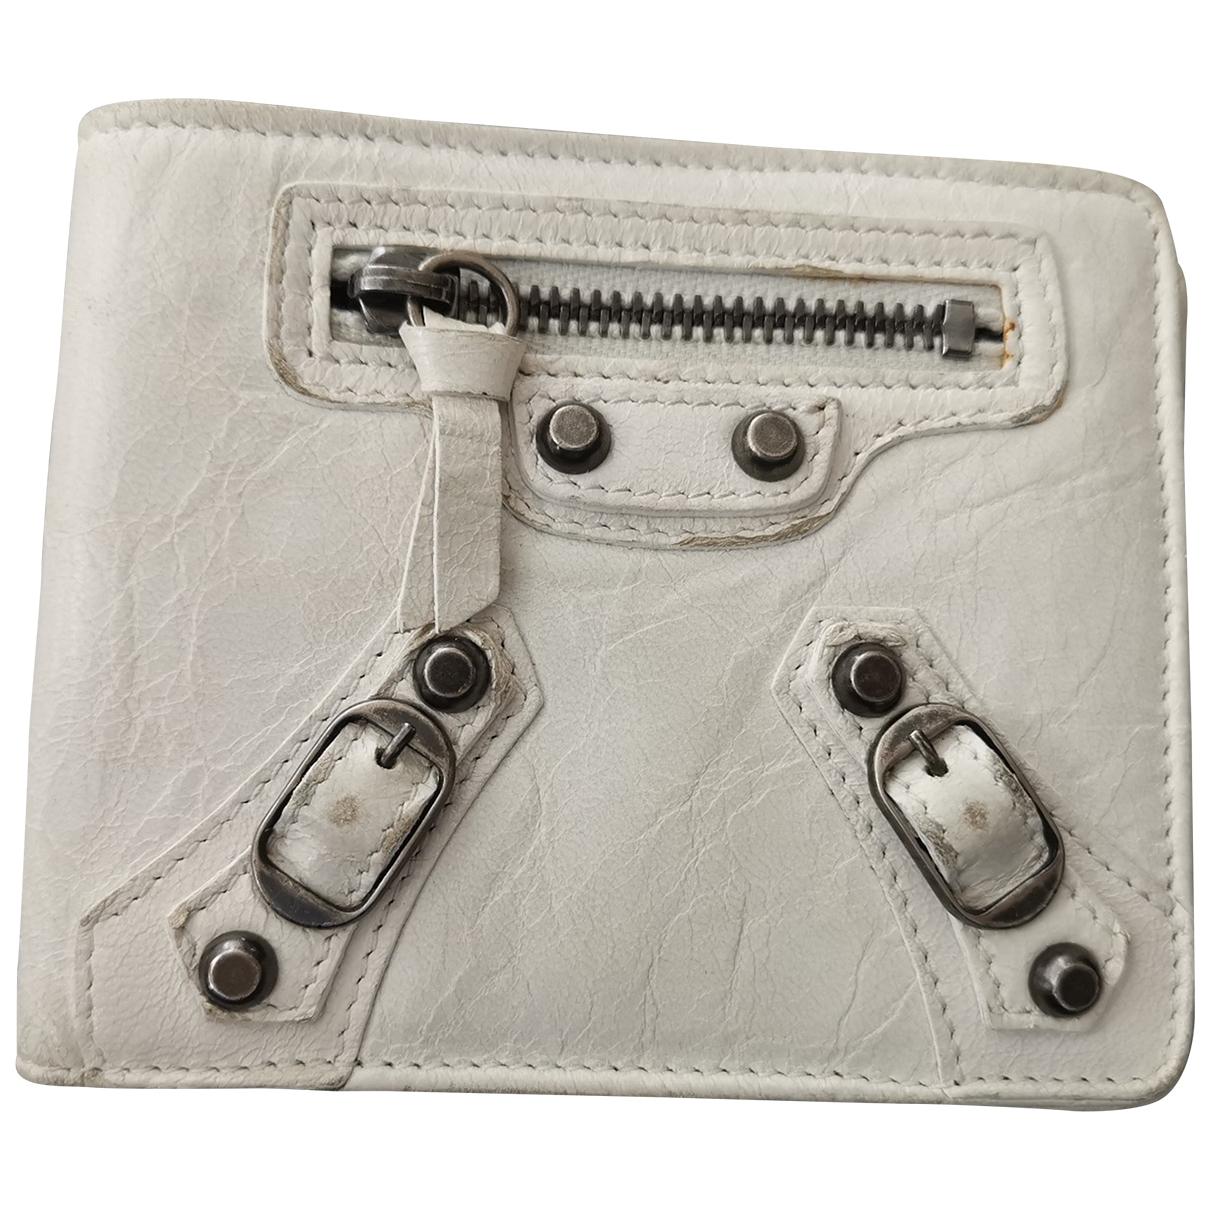 Balenciaga \N White Leather wallet for Women \N